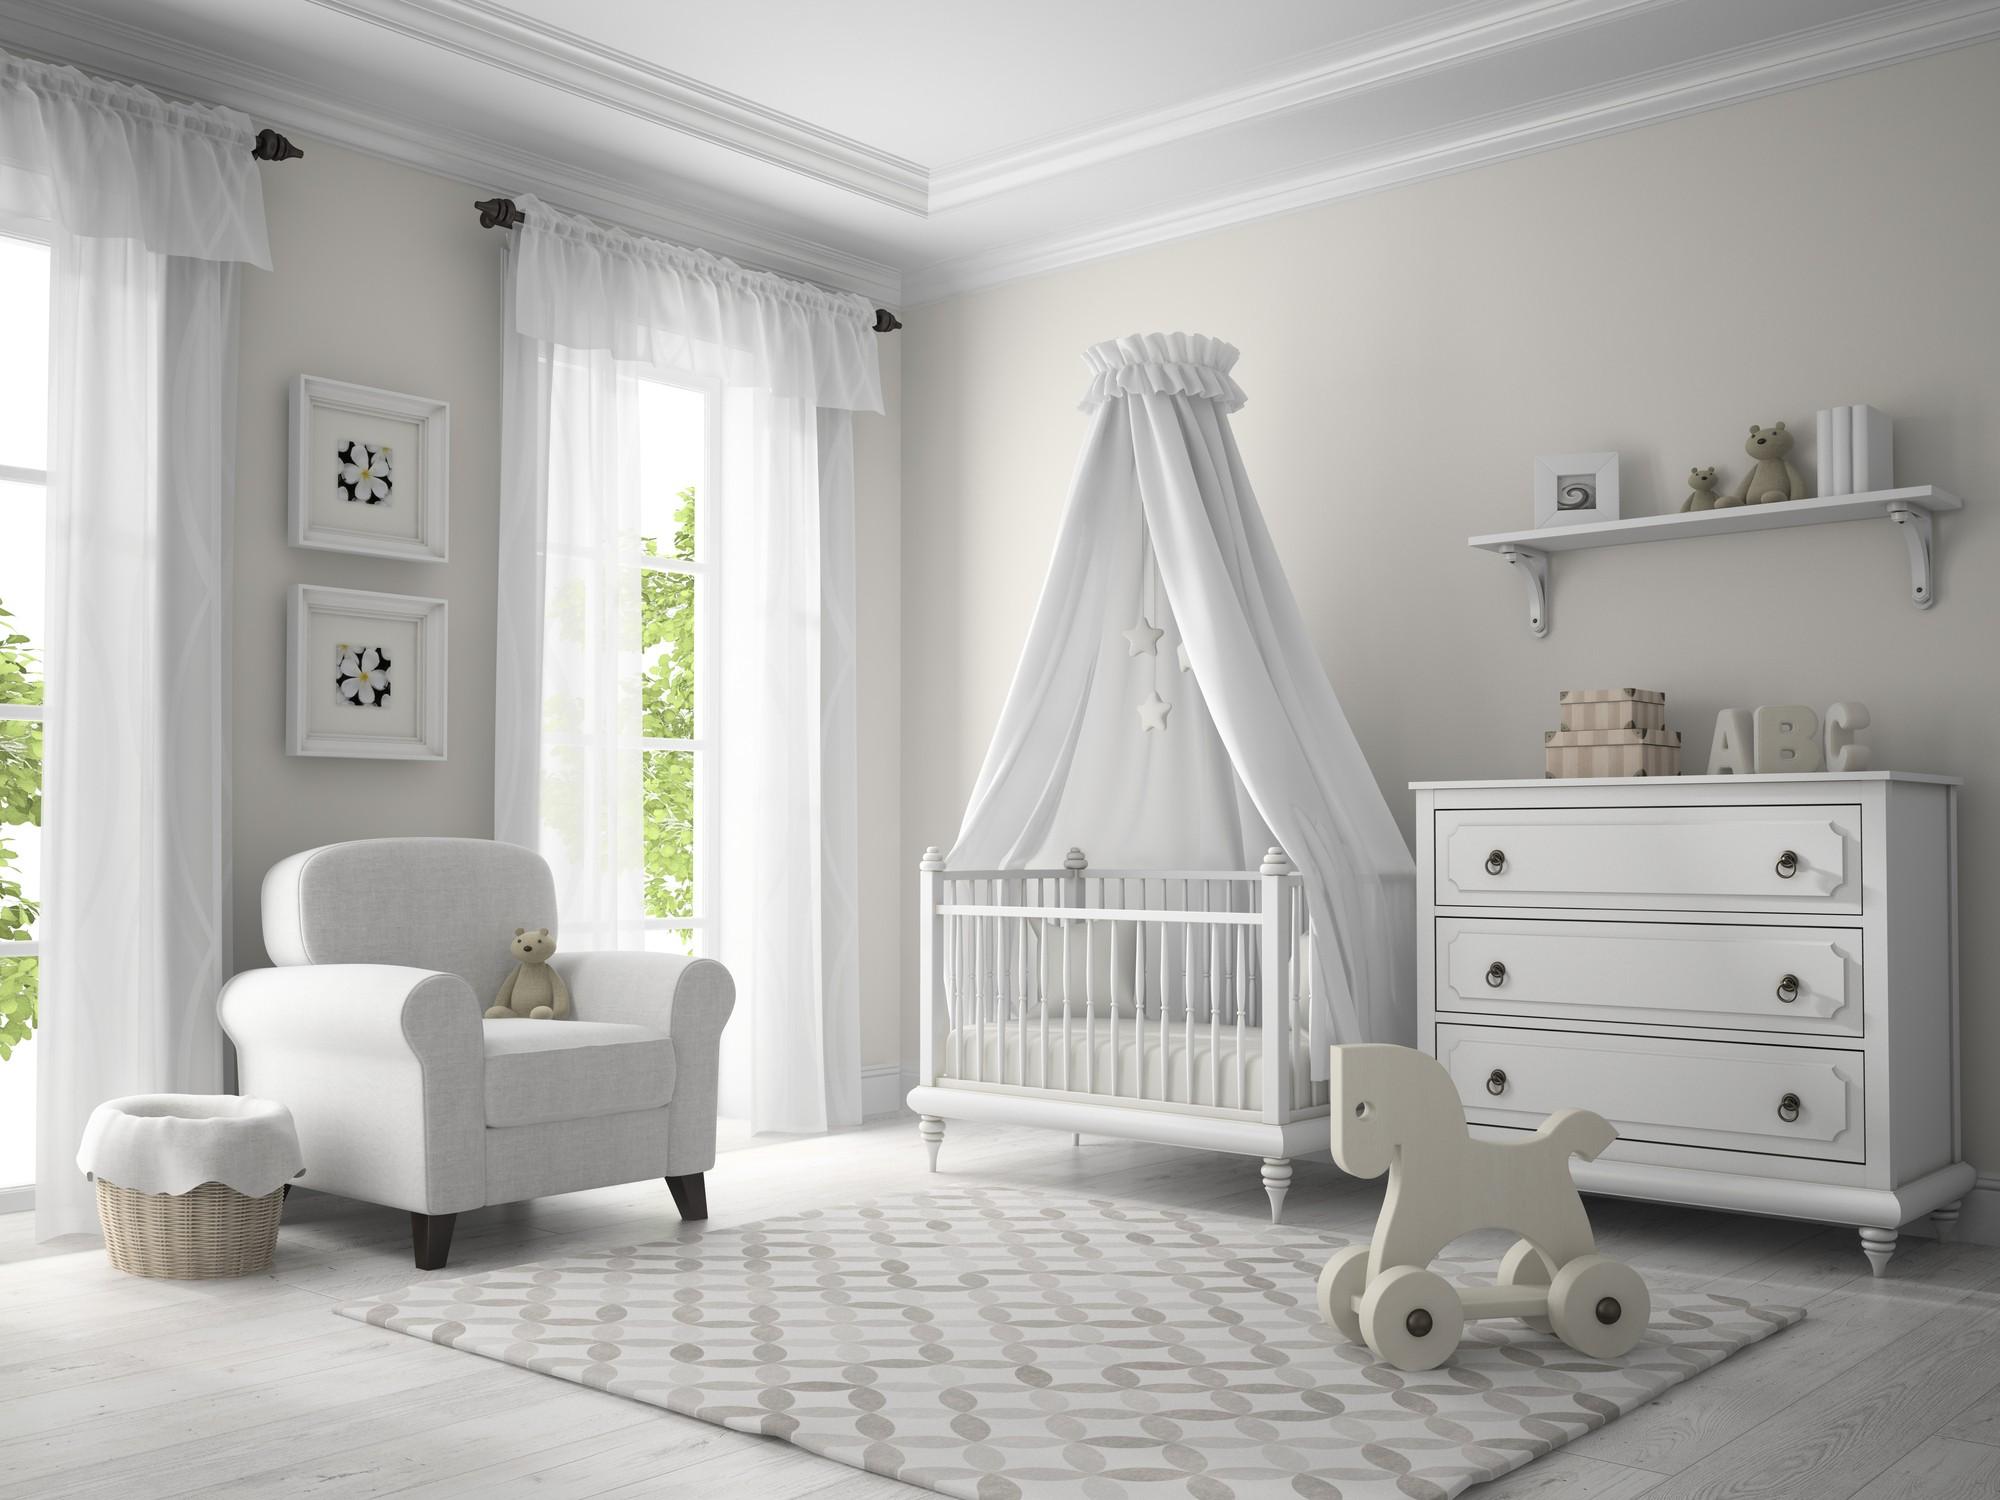 Elegant white nursery or baby's room